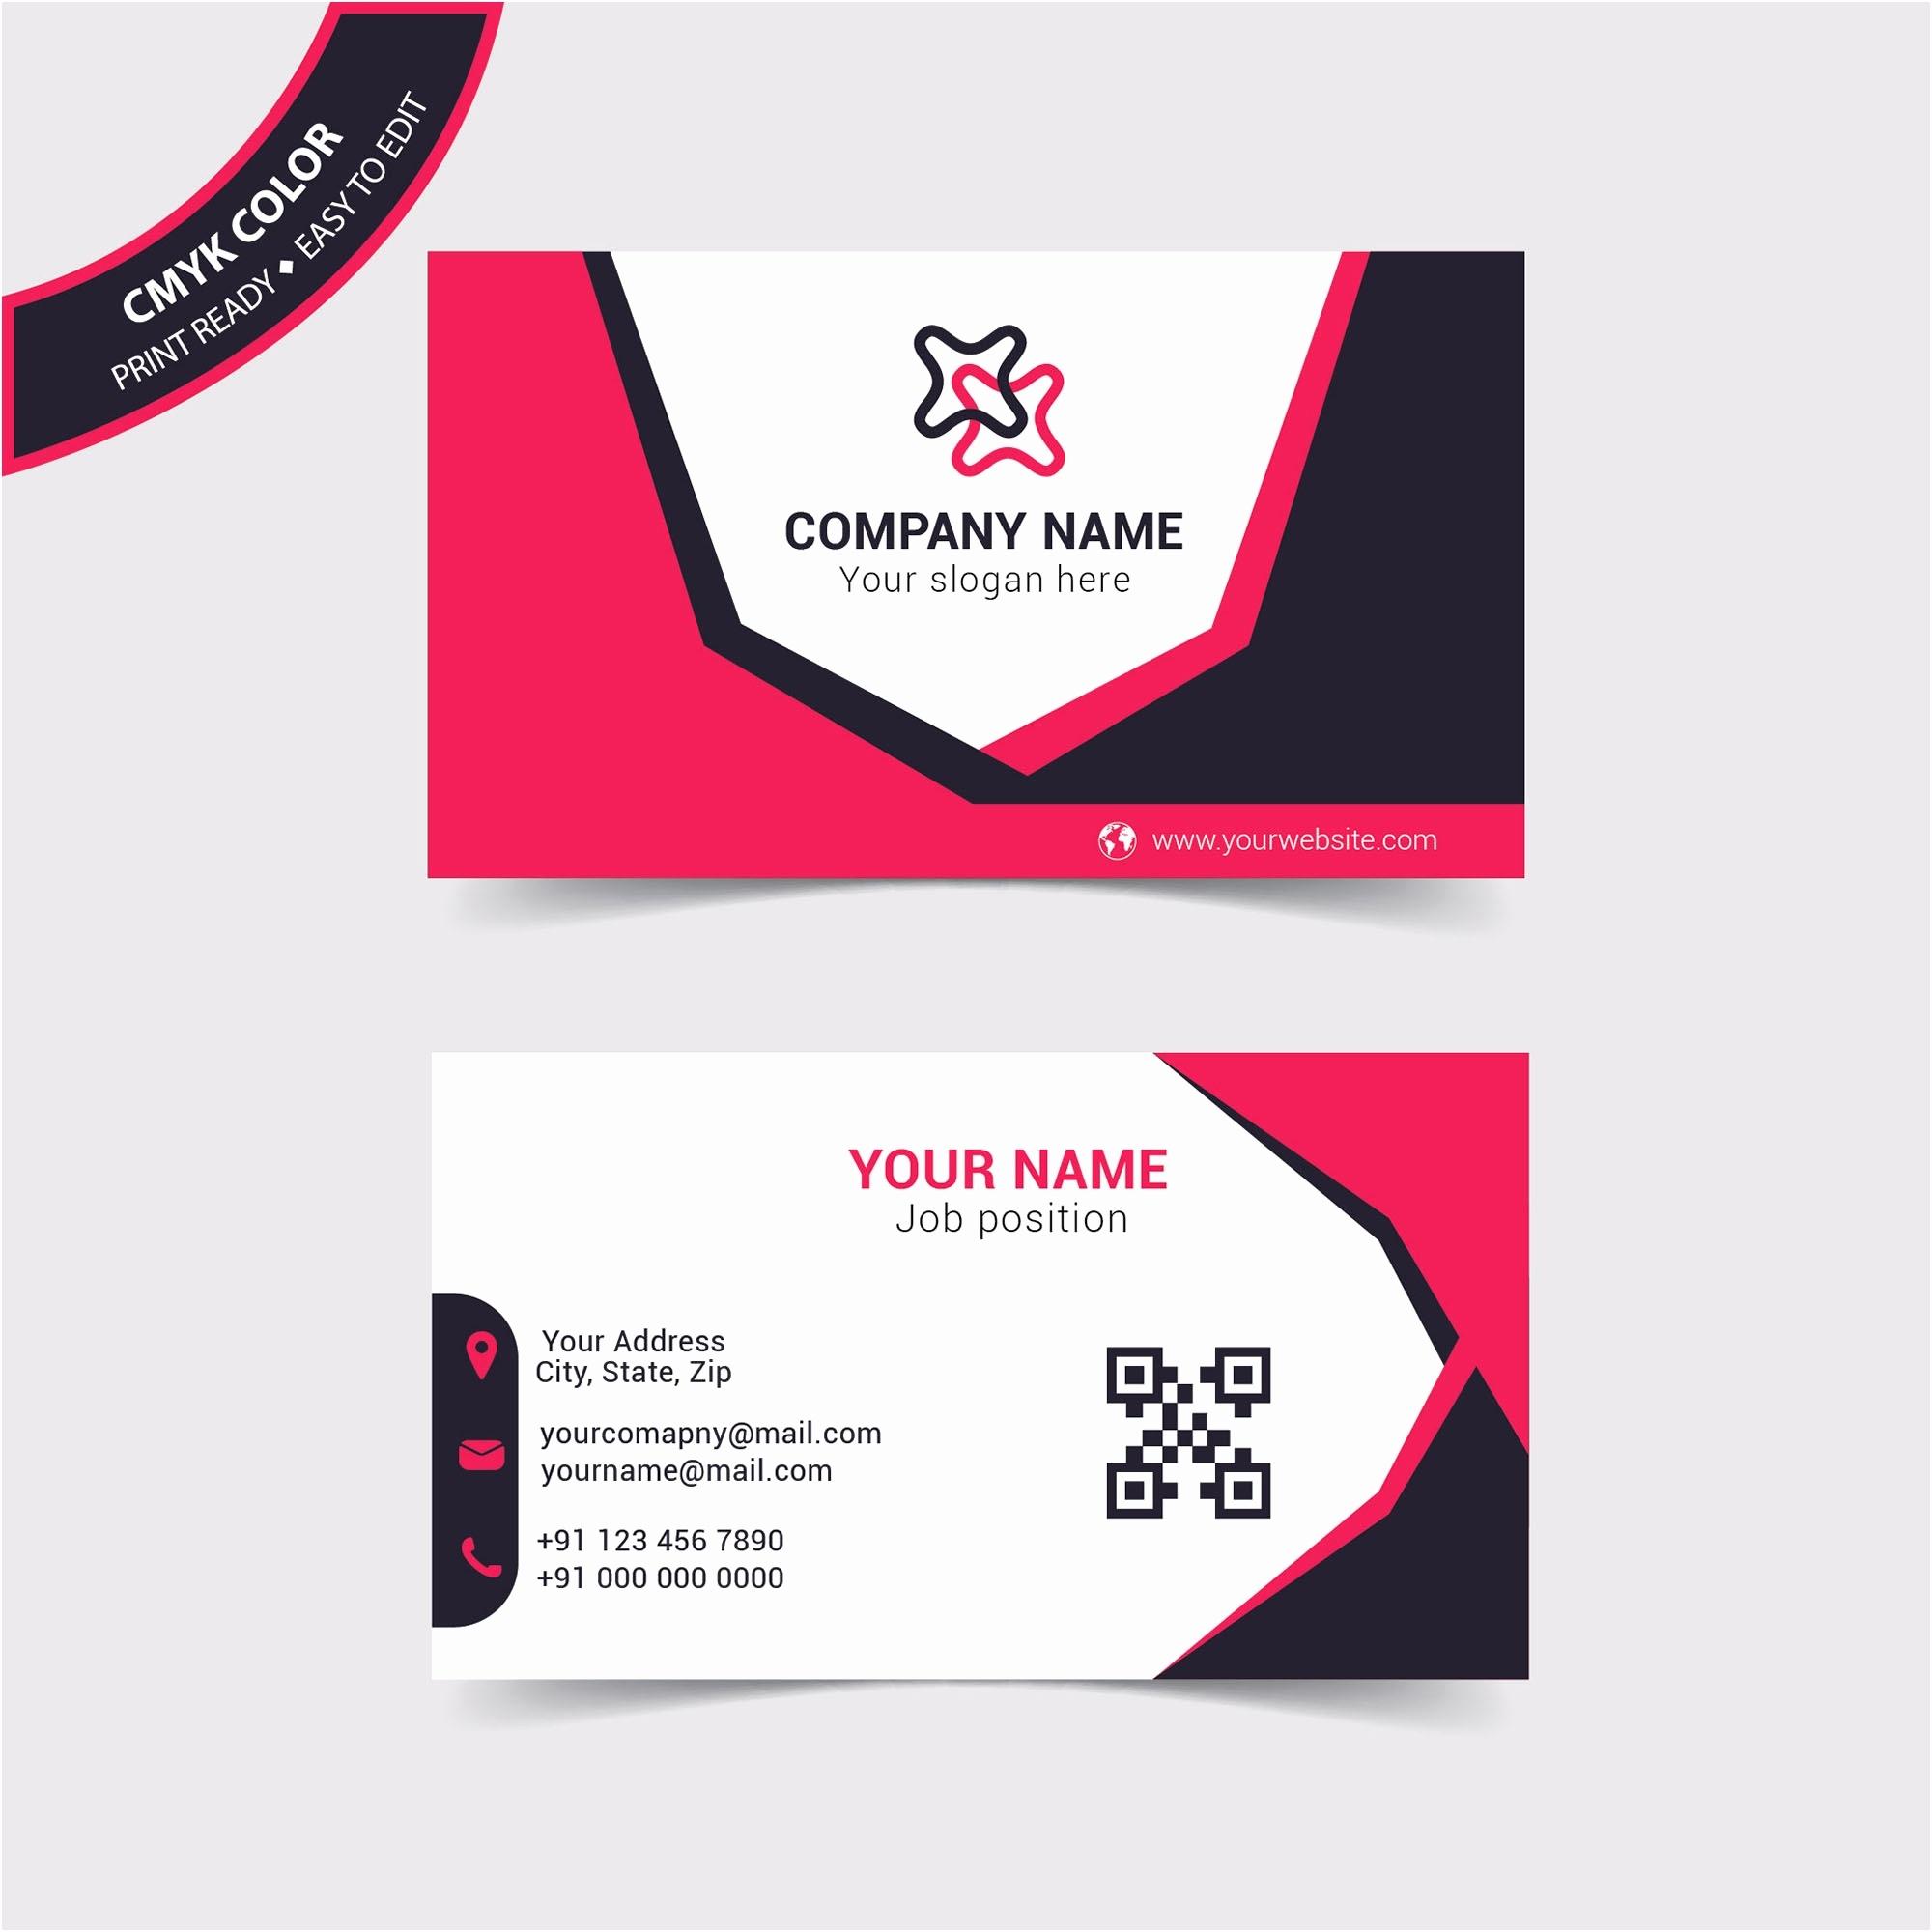 Business Card Maker Online New Business Card Maker Line Free - Card Maker Online Free Printable